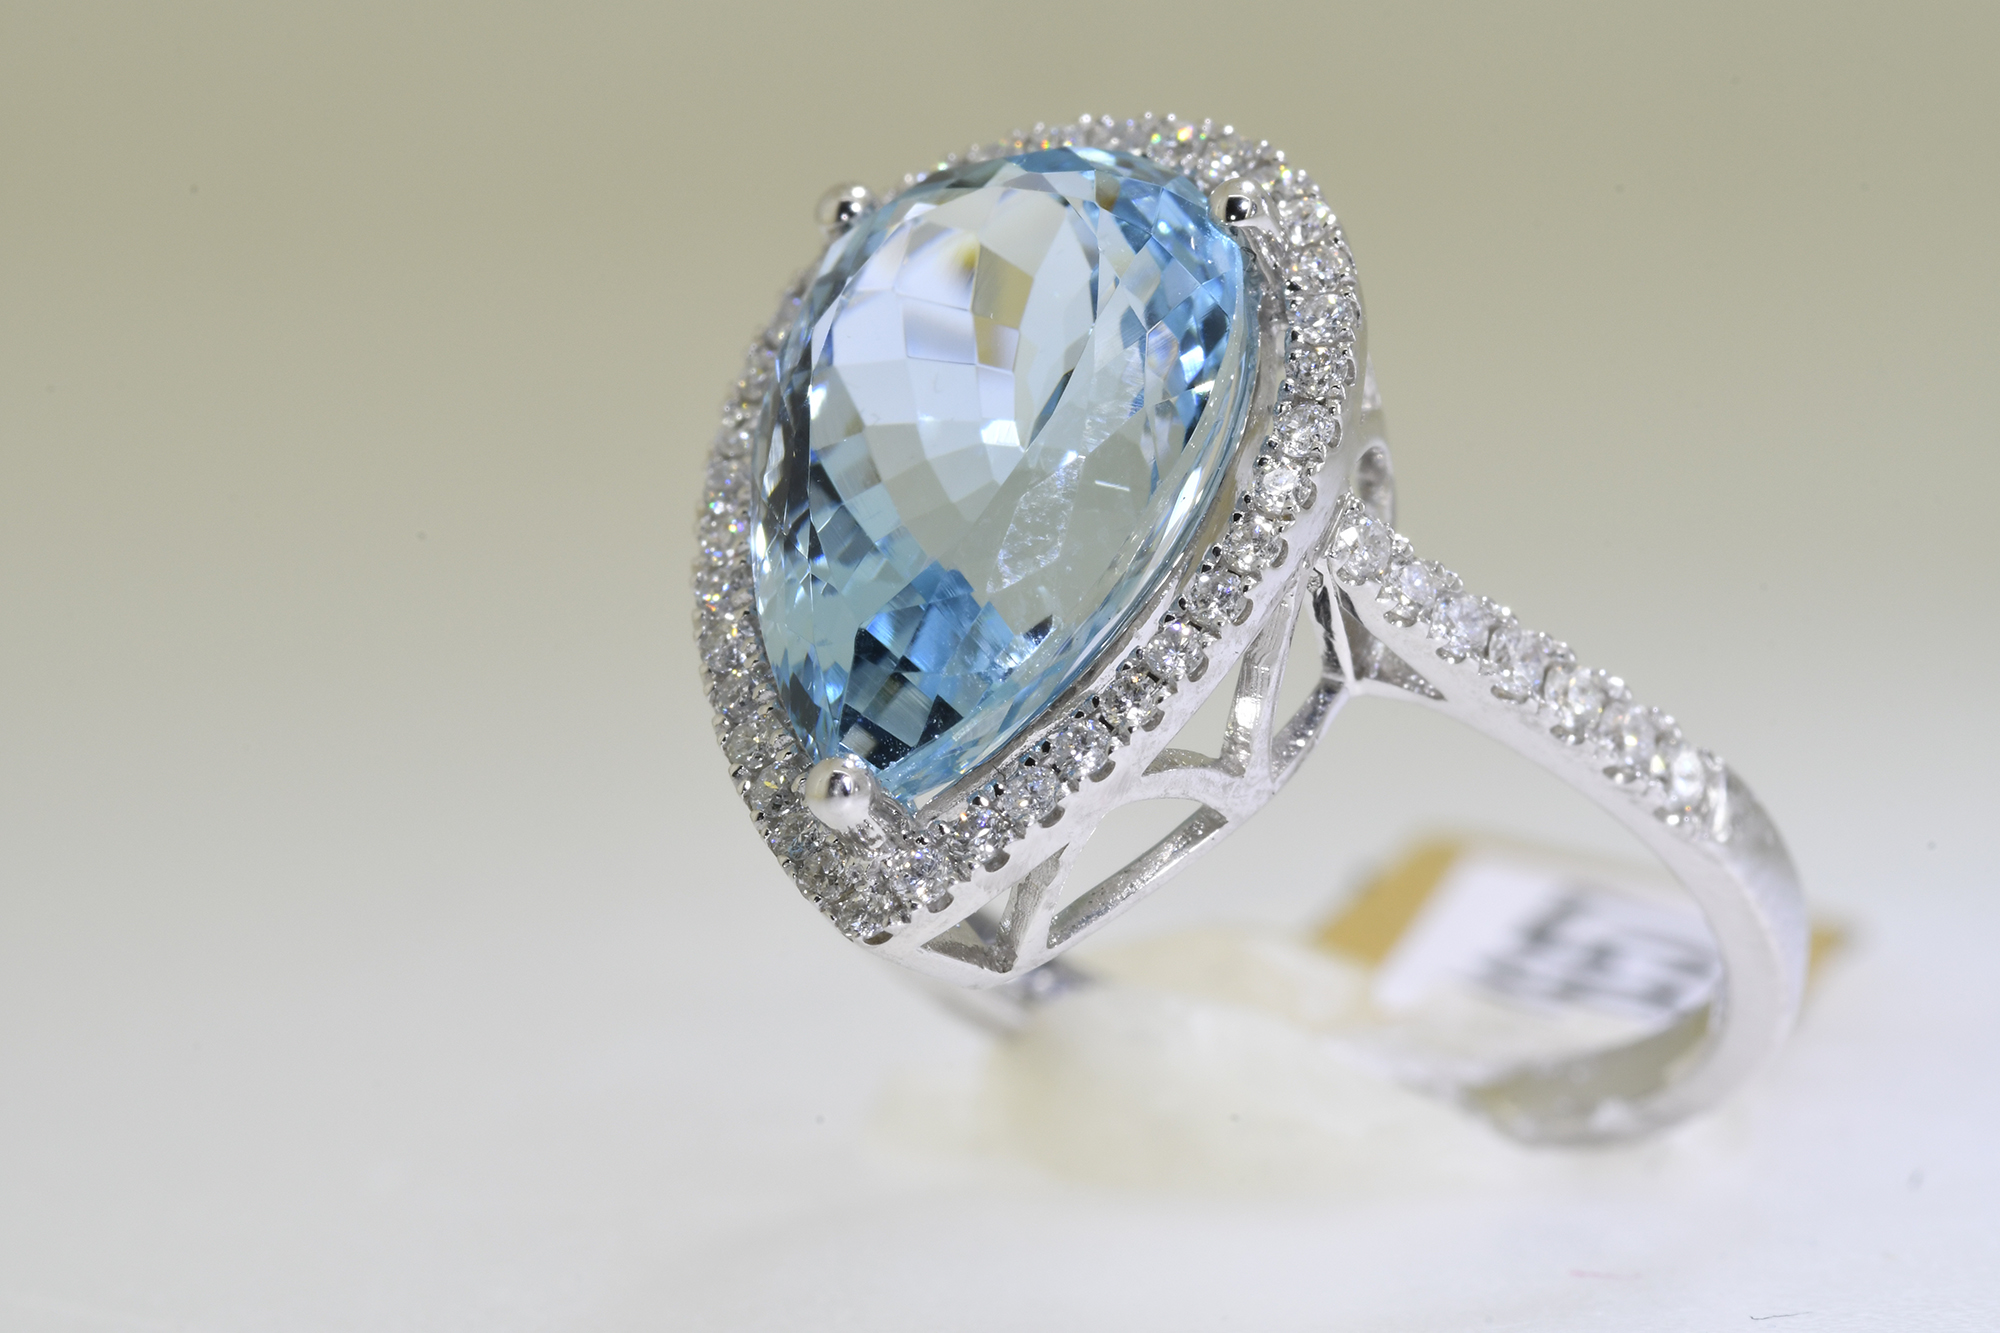 Aquamarine & Diamond Ring - Image 2 of 5